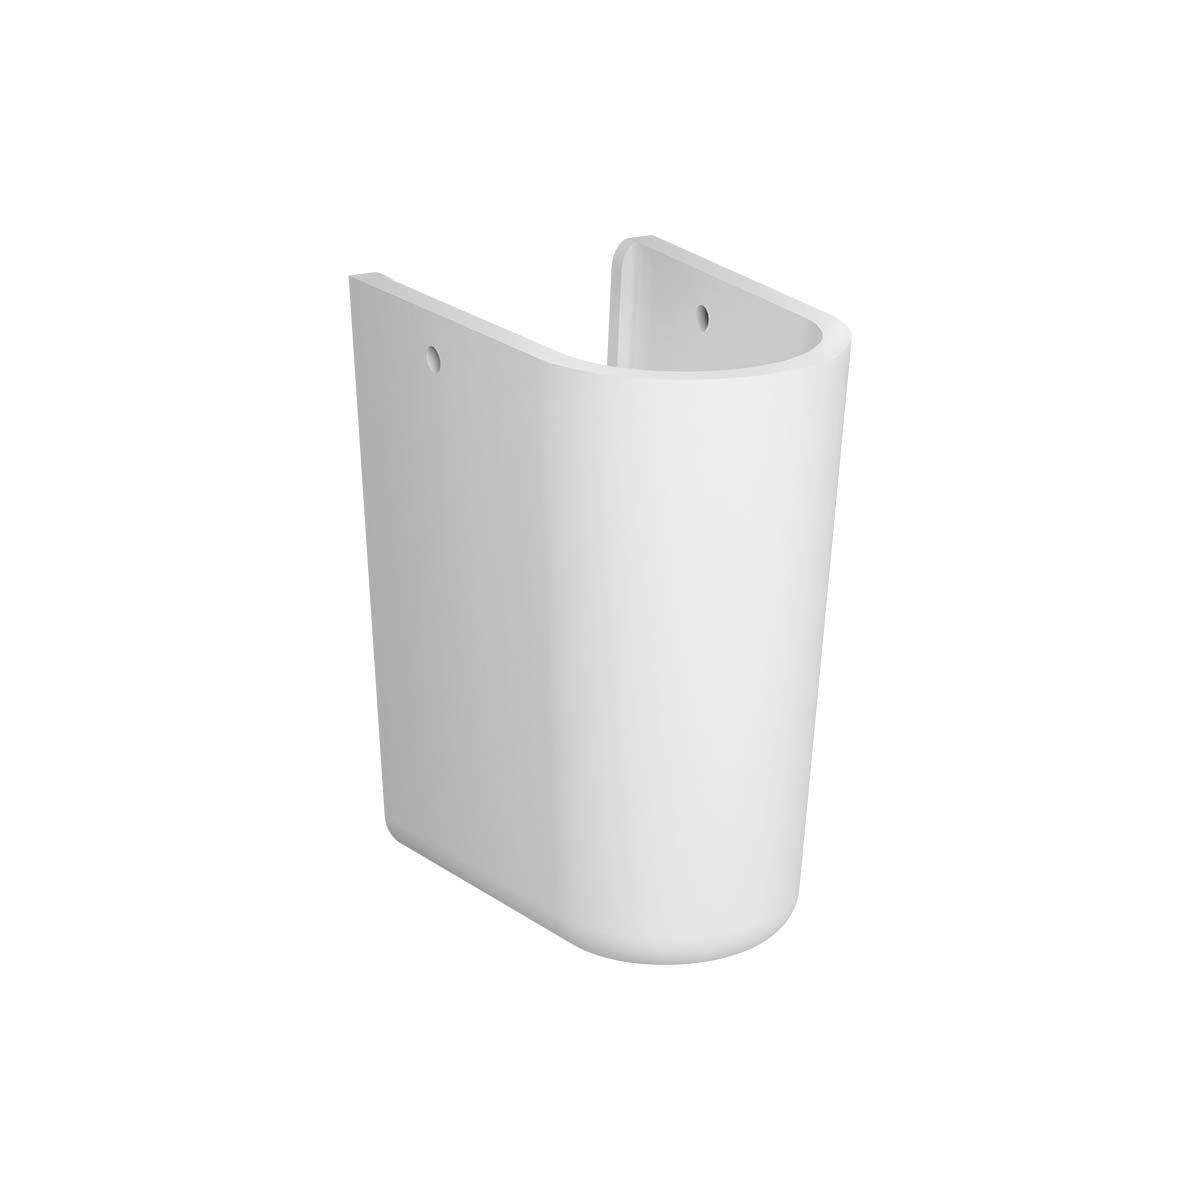 Vitra Layton 450mm Cloakroom Basin and Small Semi Pedestal 1 Tap Hole